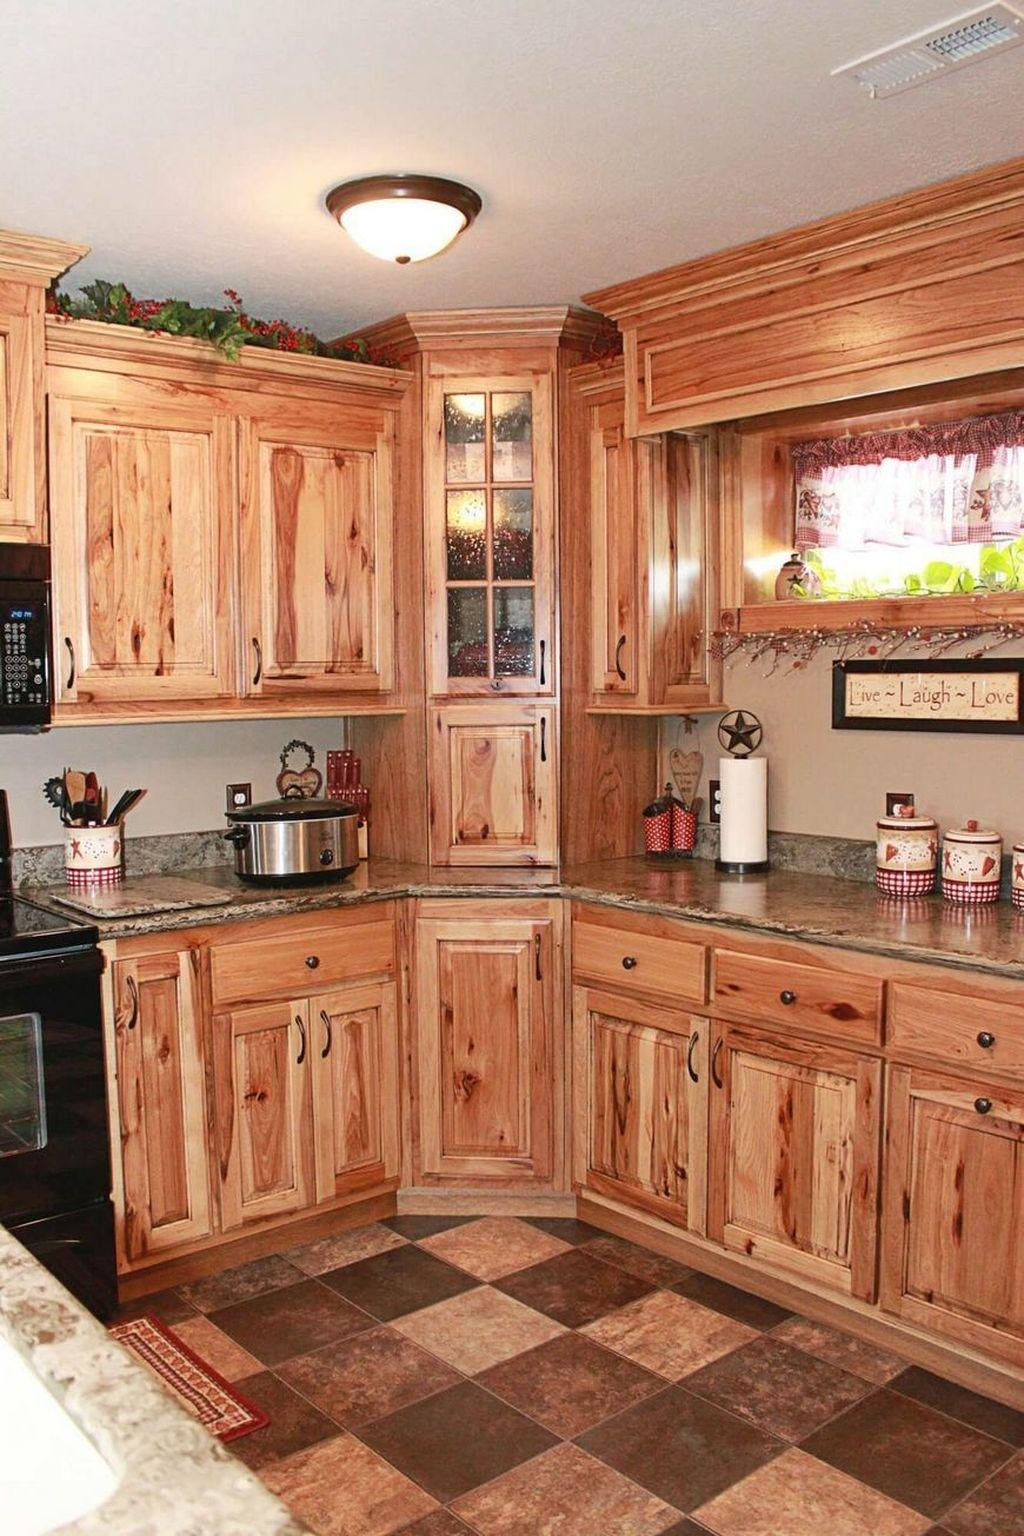 Nice Rustic Farmhouse Kitchen Cabinets Design Ideas 06   HOMYHOMEE